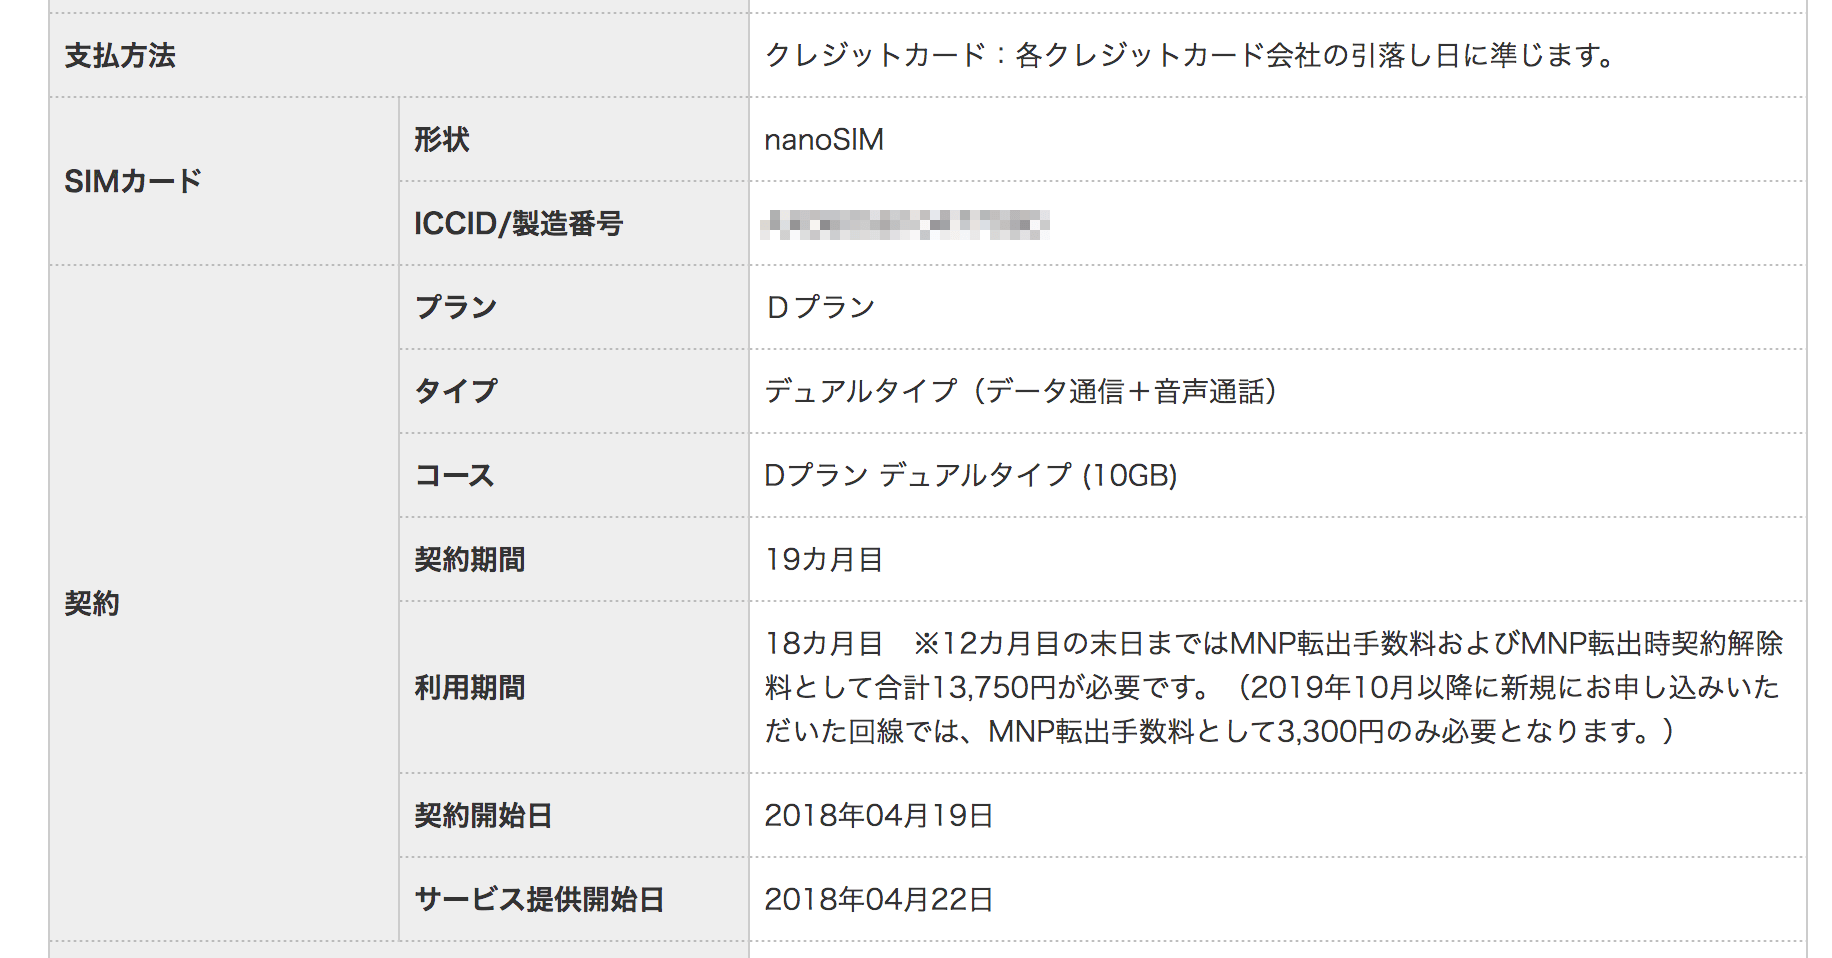 mineoの2019年10月時点の契約情報